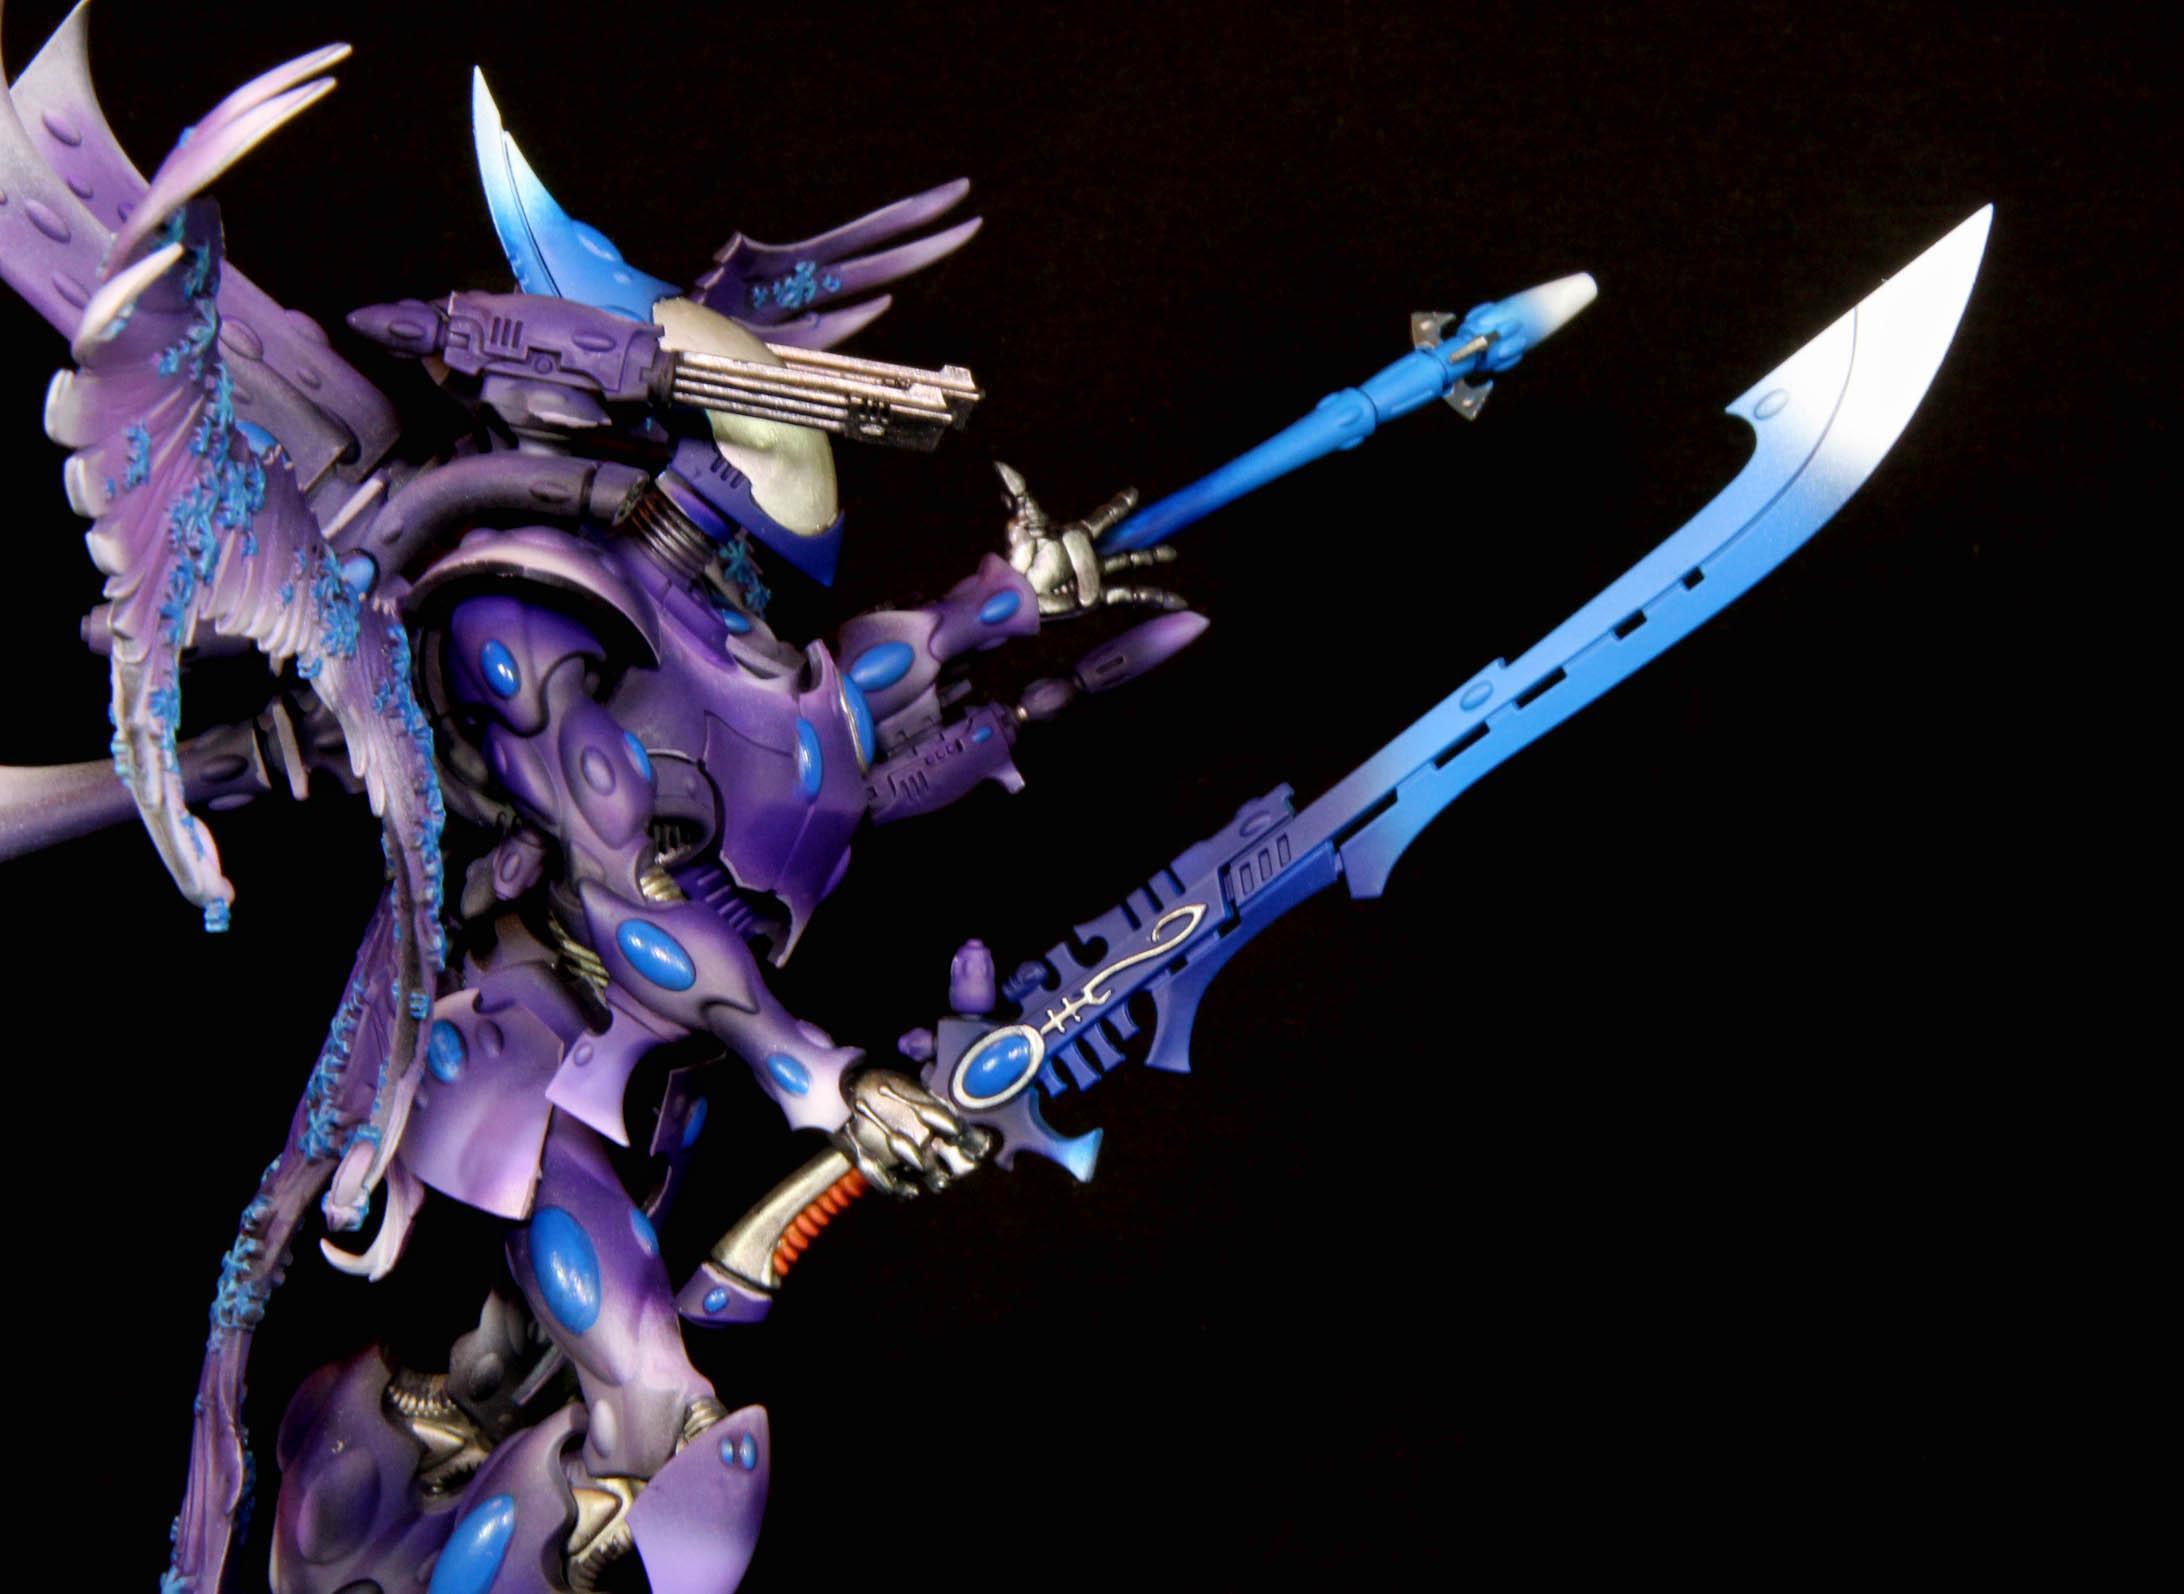 Eldar, Warhammer 40,000, Warhammer Fantasy, Wraithknight